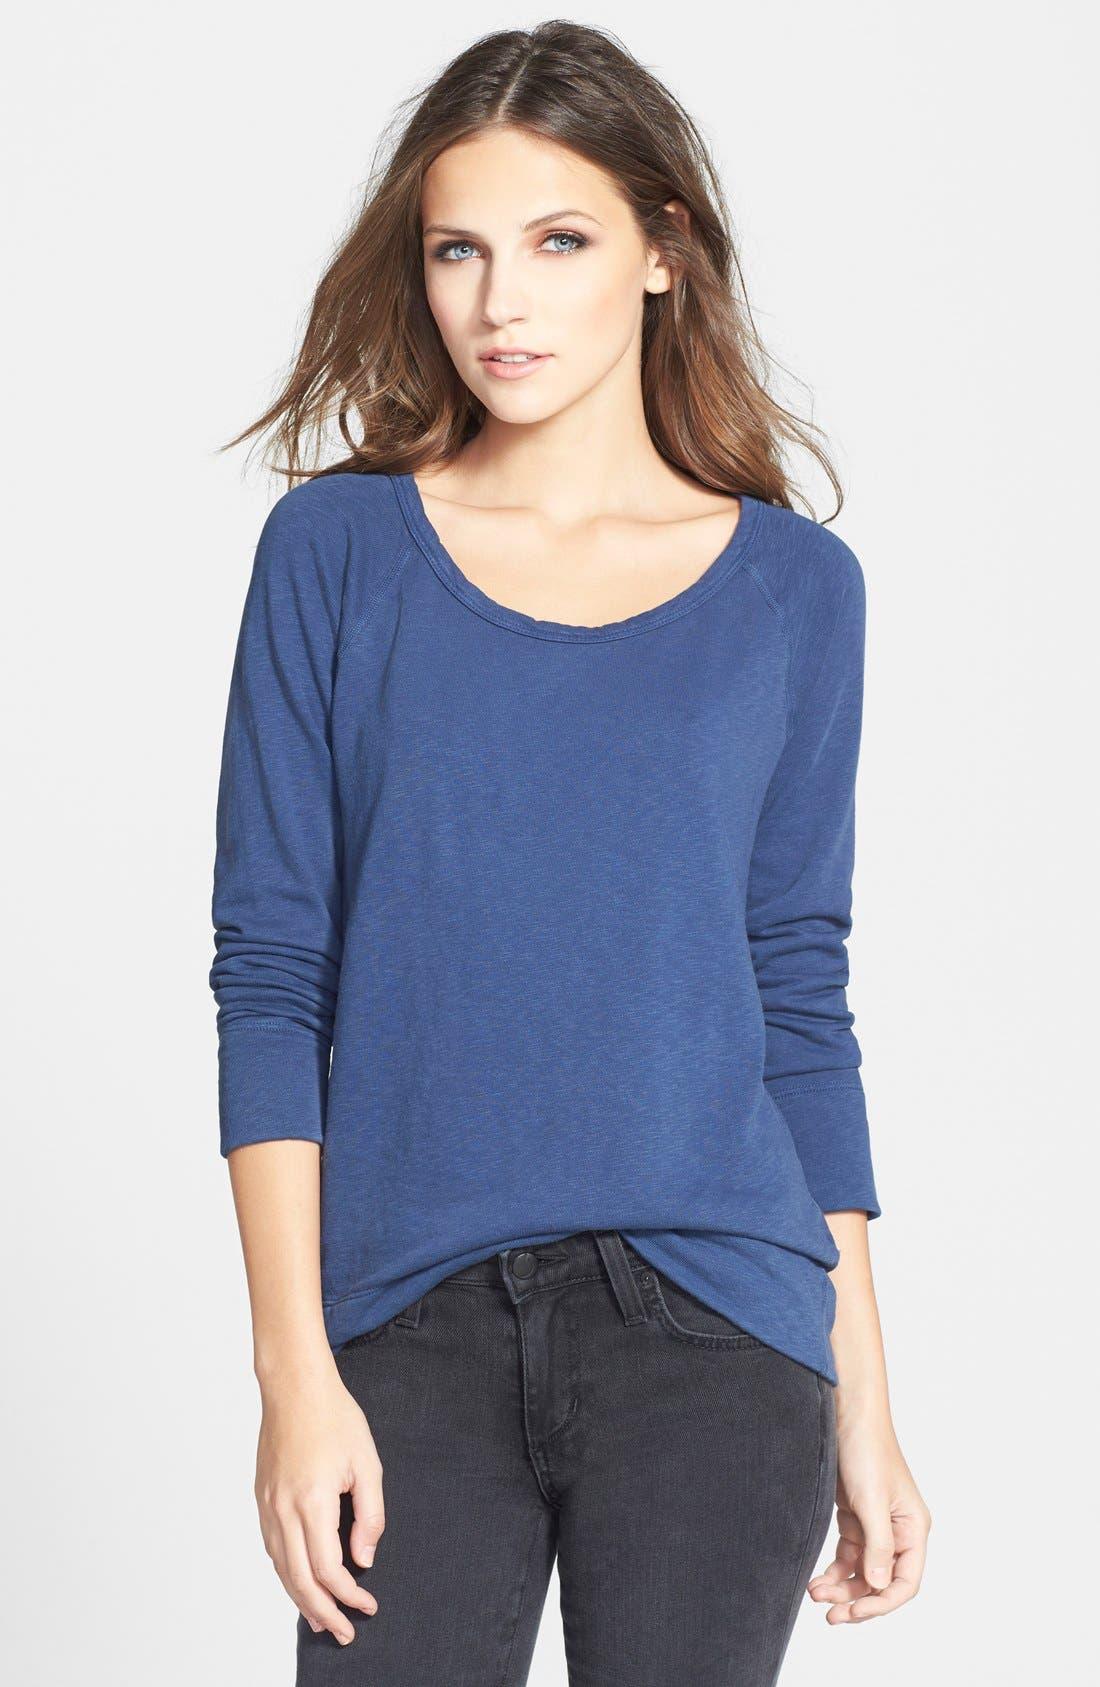 Alternate Image 1 Selected - James Perse 'Vintage' Cotton Raglan Pullover